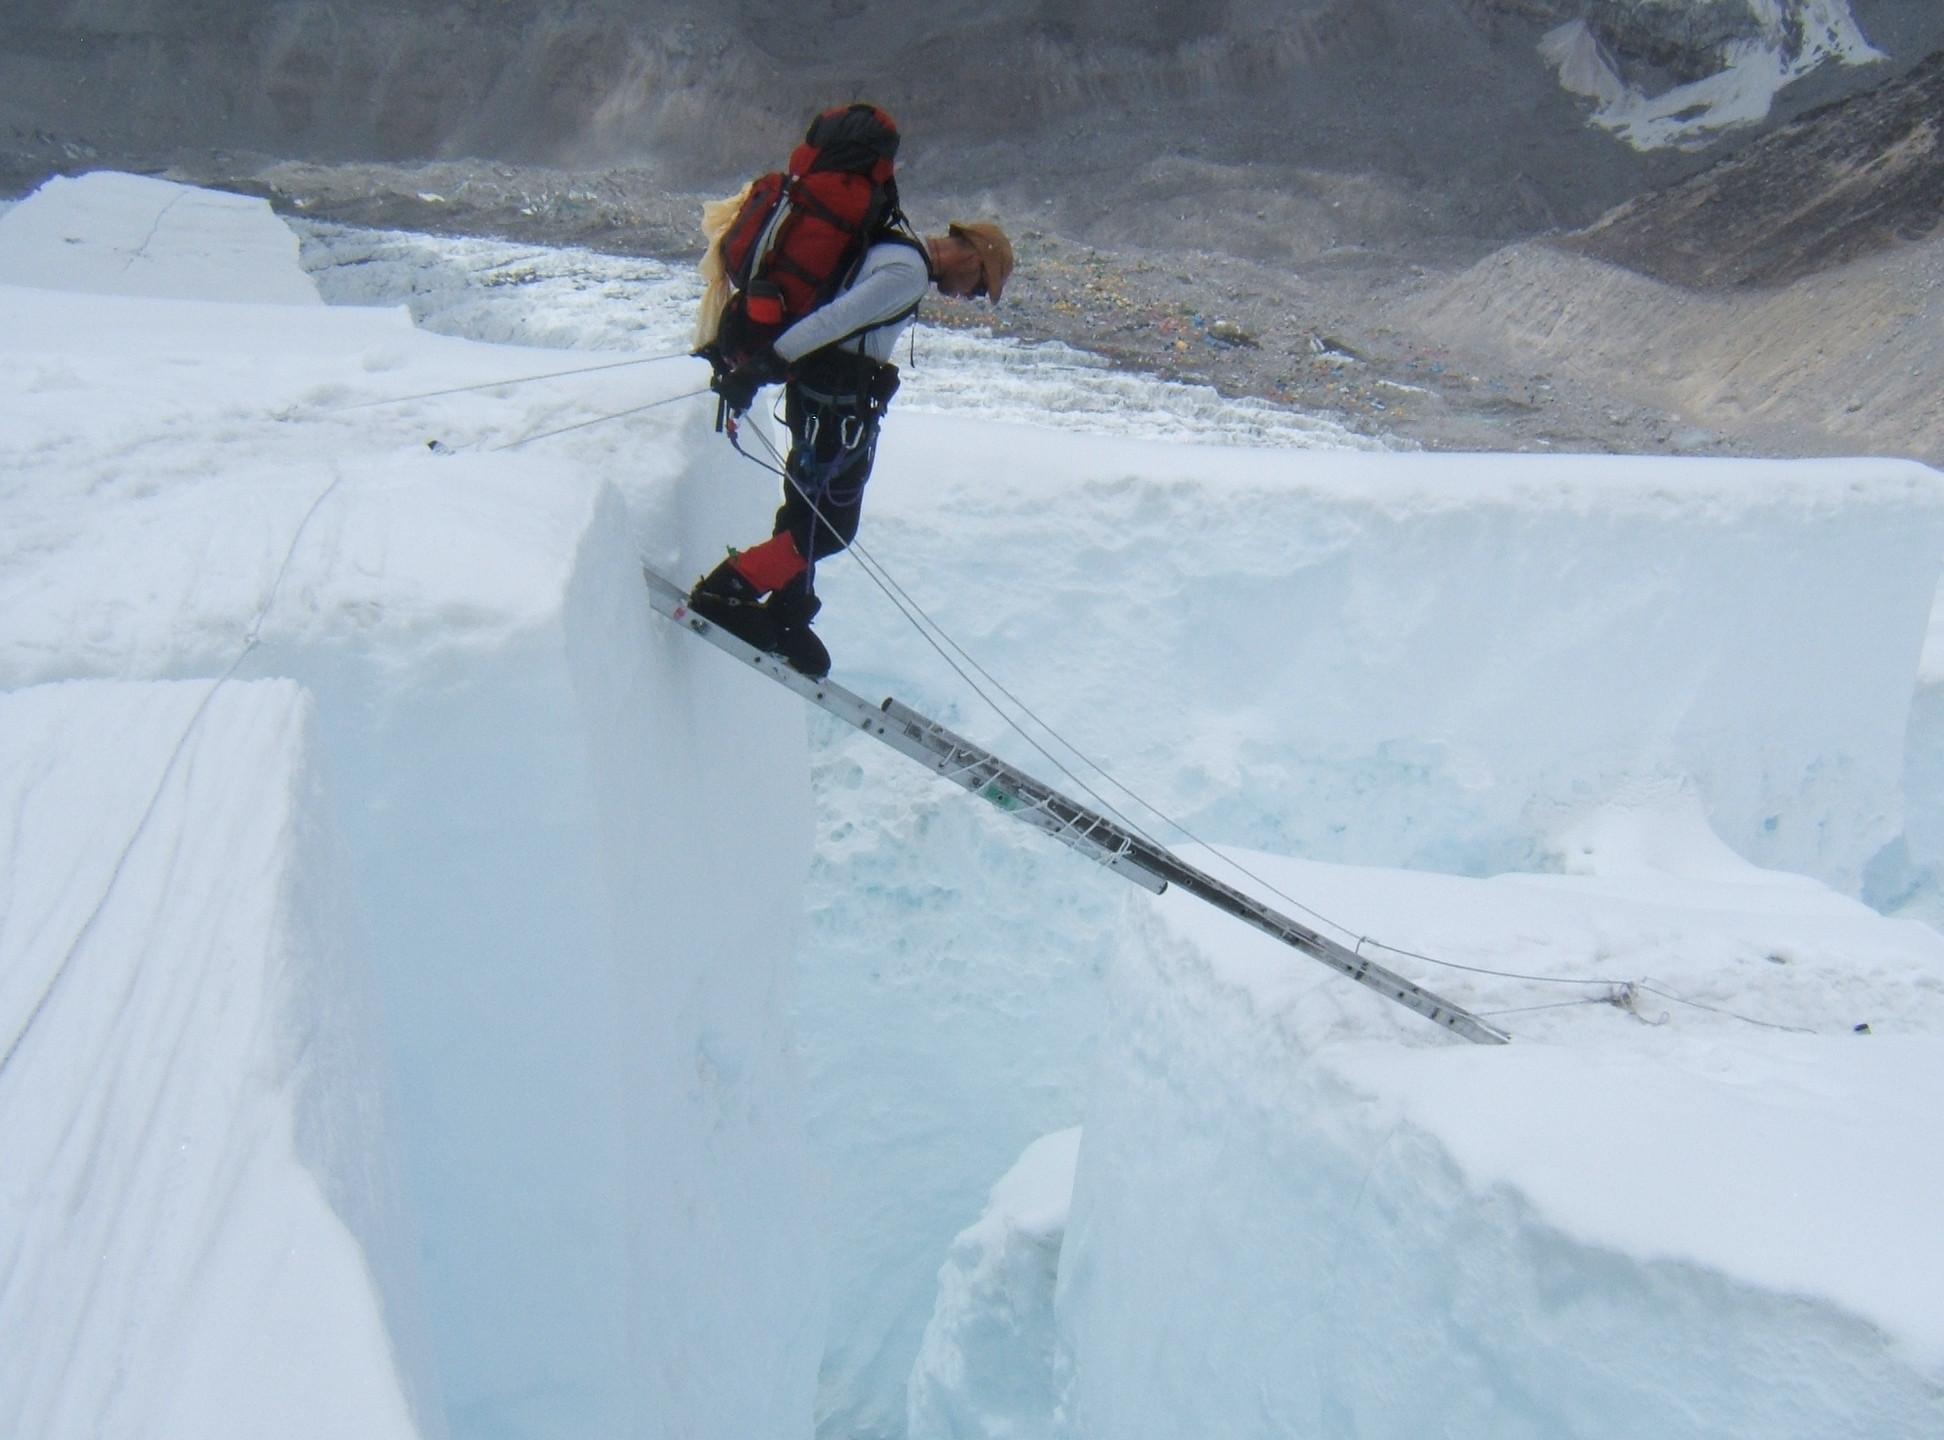 Crossing a crevasse